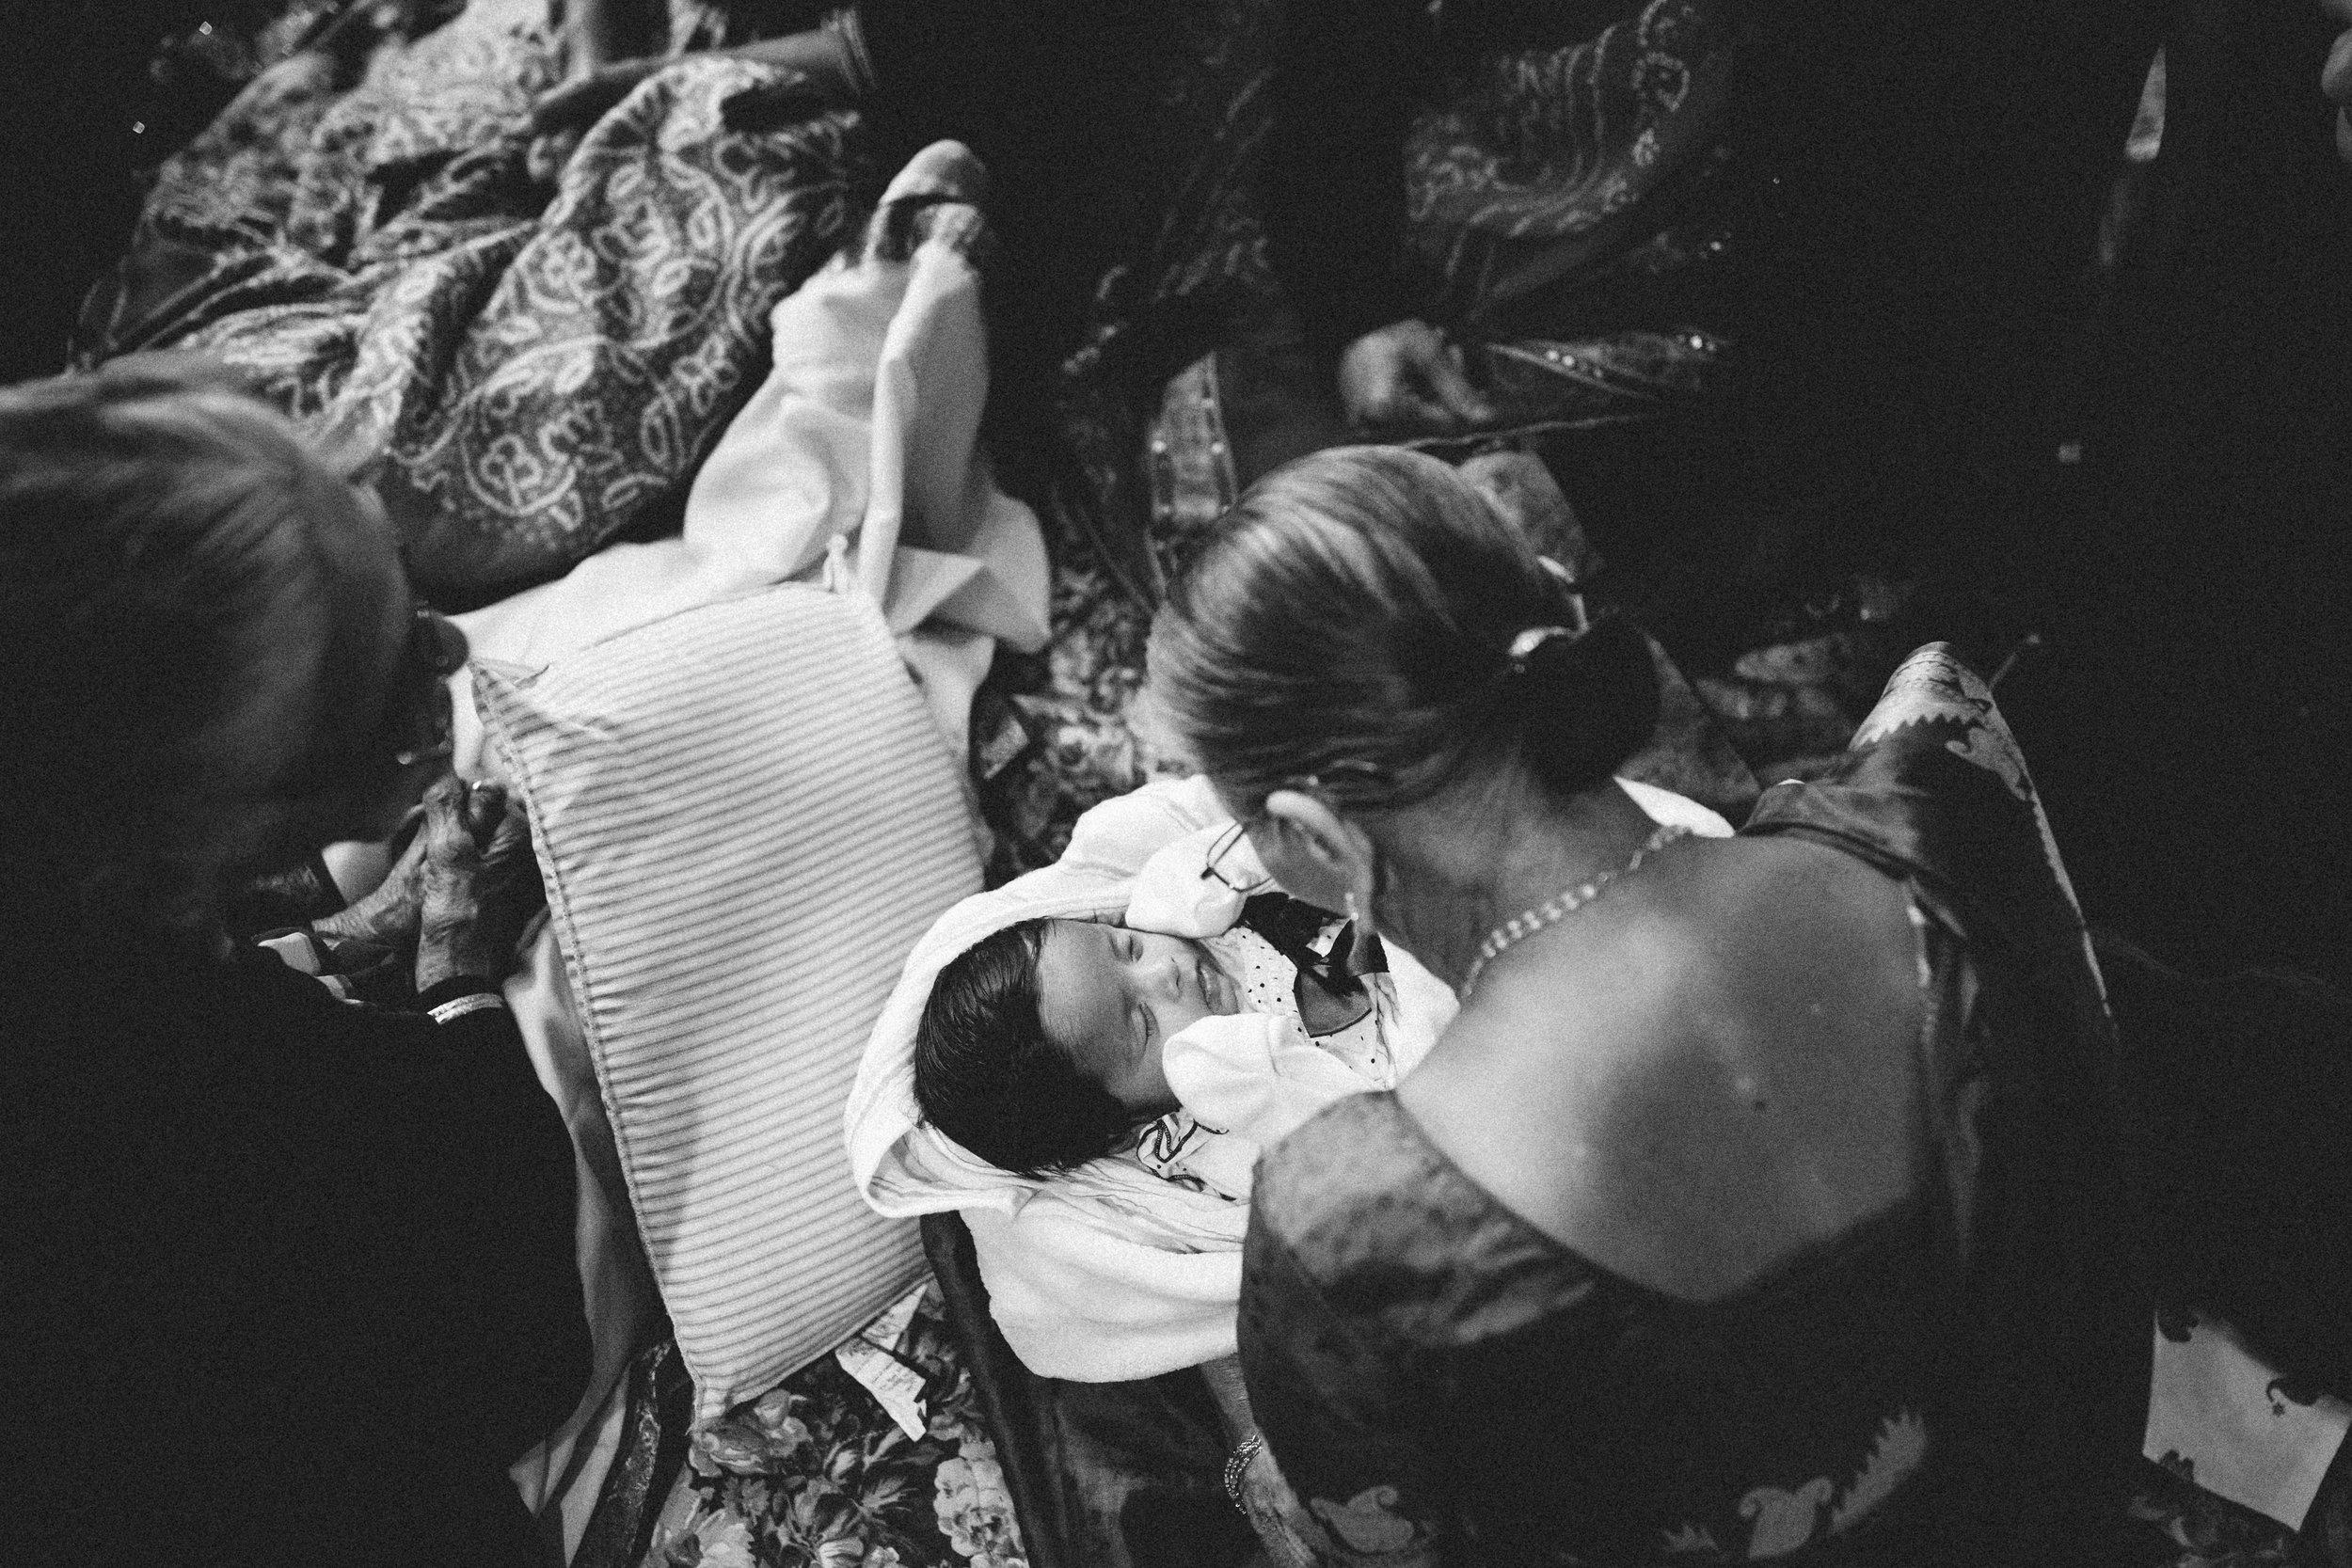 Aparna-Ankit-Patel-Mehndi-Wedding-Photos-0045.jpg